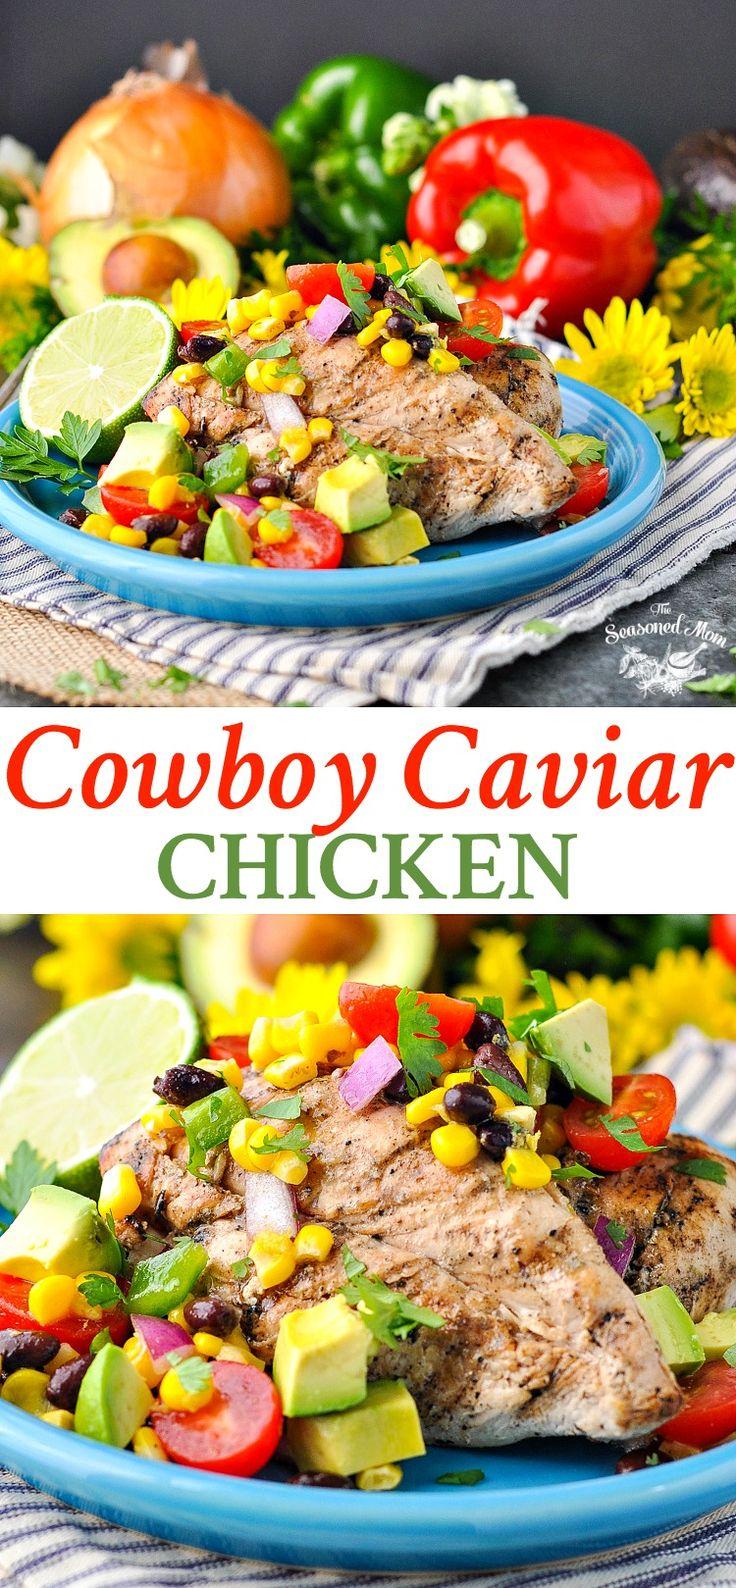 Cowboy Caviar Chicken   Salad Recipes   Healthy Dinner Recipes   Dinner Ideas   Easy Dinner Recipes   Salsa Recipes   Fresh Tomatoes   Corn   Clean Eating   Grilled Chicken   Chicken Breast Recipes   Healthy Recipes Easy